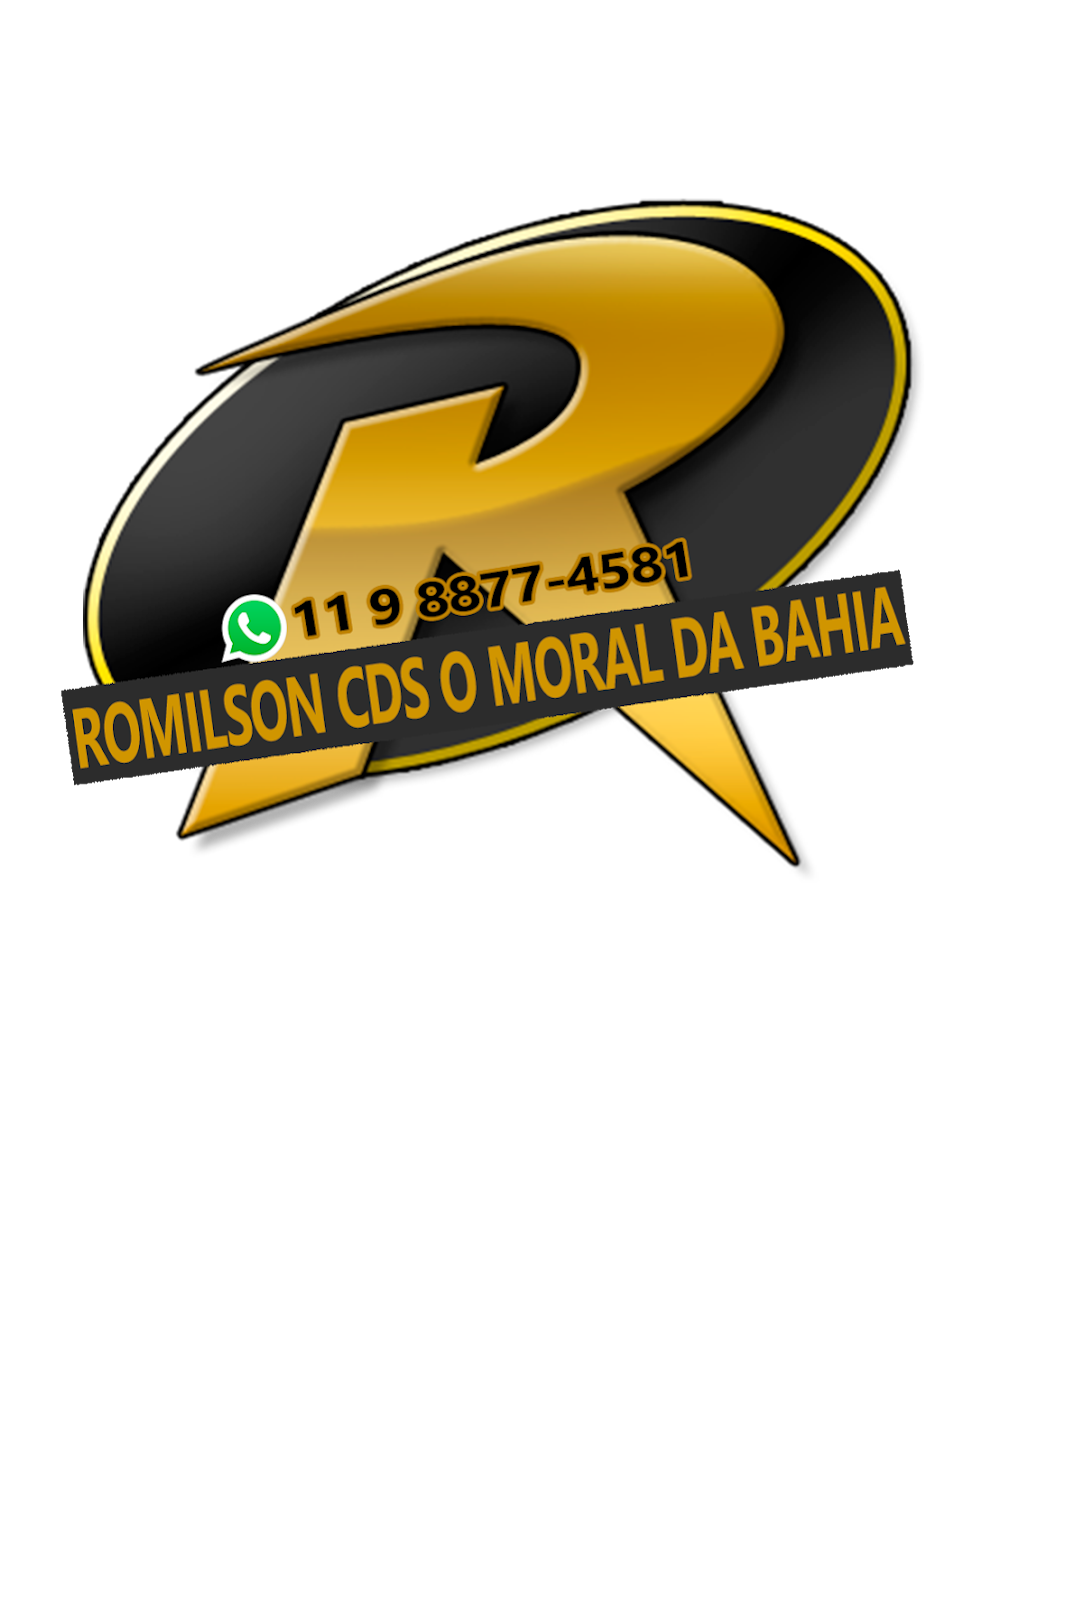 ROMILSON CDS  O MORAL DA BAHIA